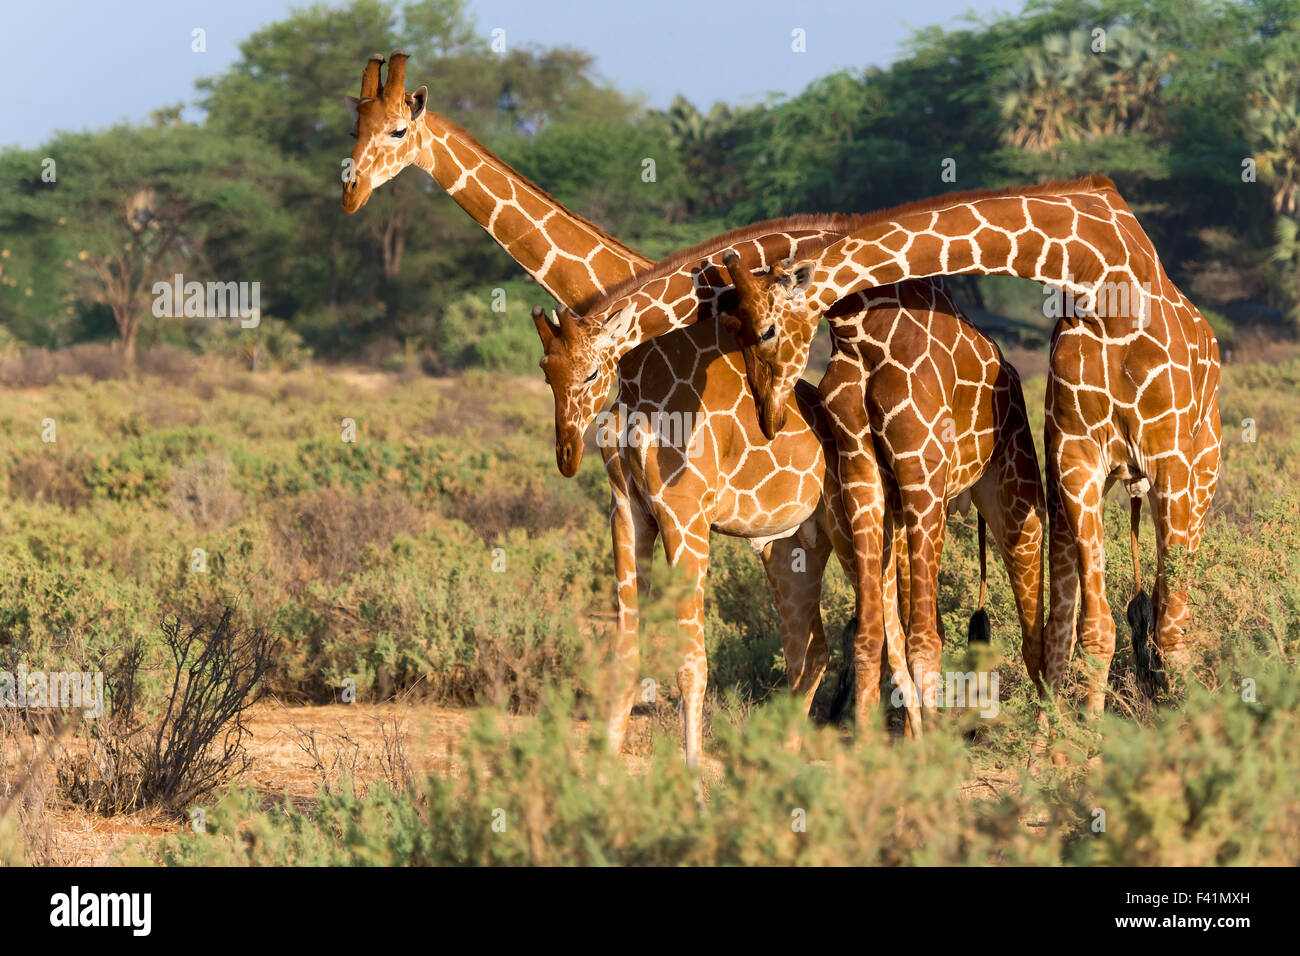 Trois girafes réticulés ou Somali (Giraffa camelopardalis reticulata), Samburu National Reserve, Kenya Banque D'Images